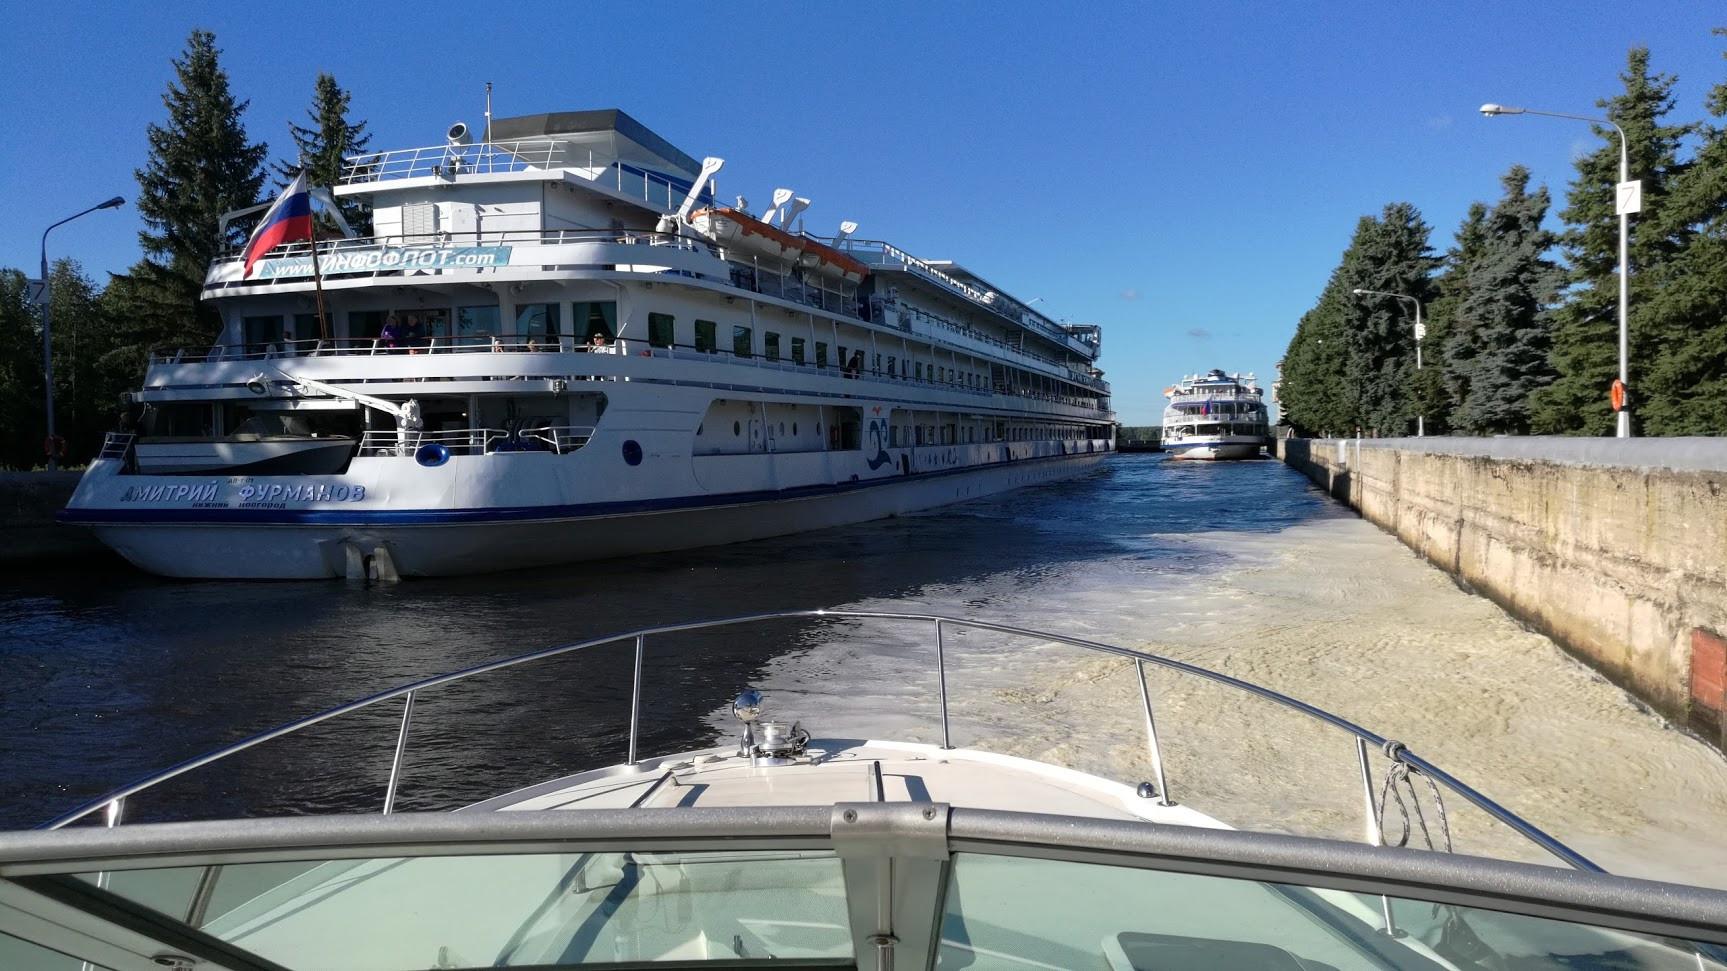 движение маломерного флота по москве реке